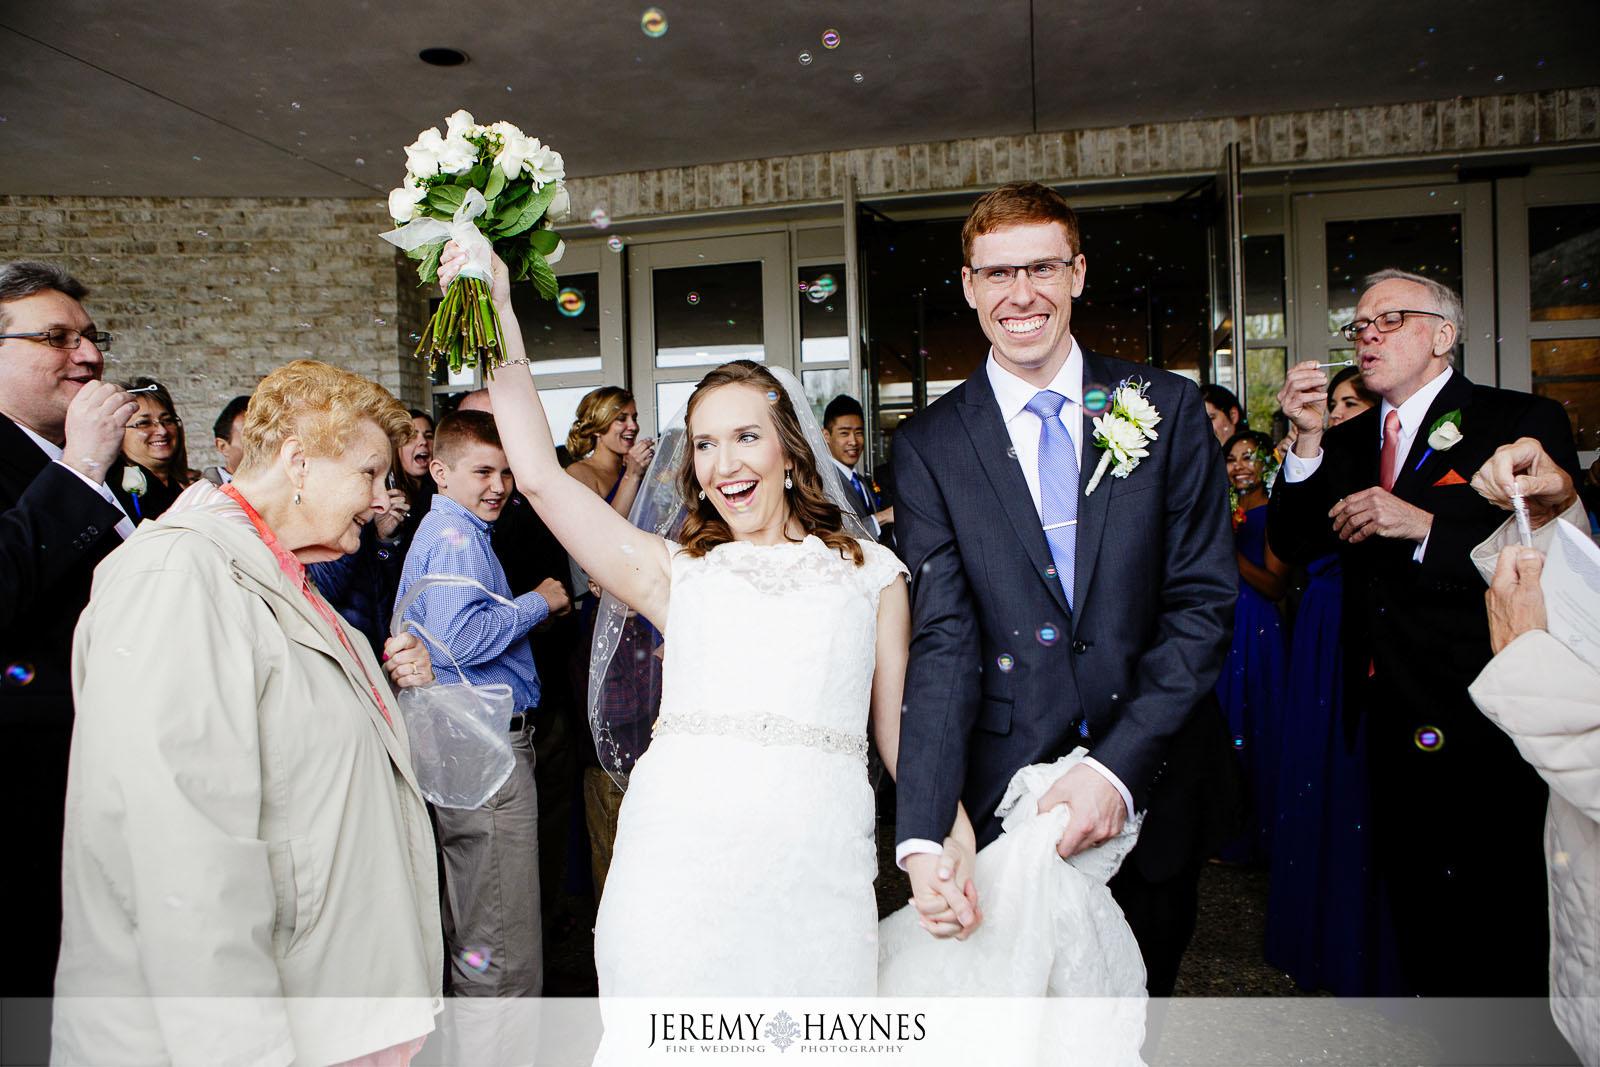 st-elizabeth-ann-seton-catholic-church-indianapolis-wedding-bubble-exit-pictures-jeremy-haynes-photography.jpg